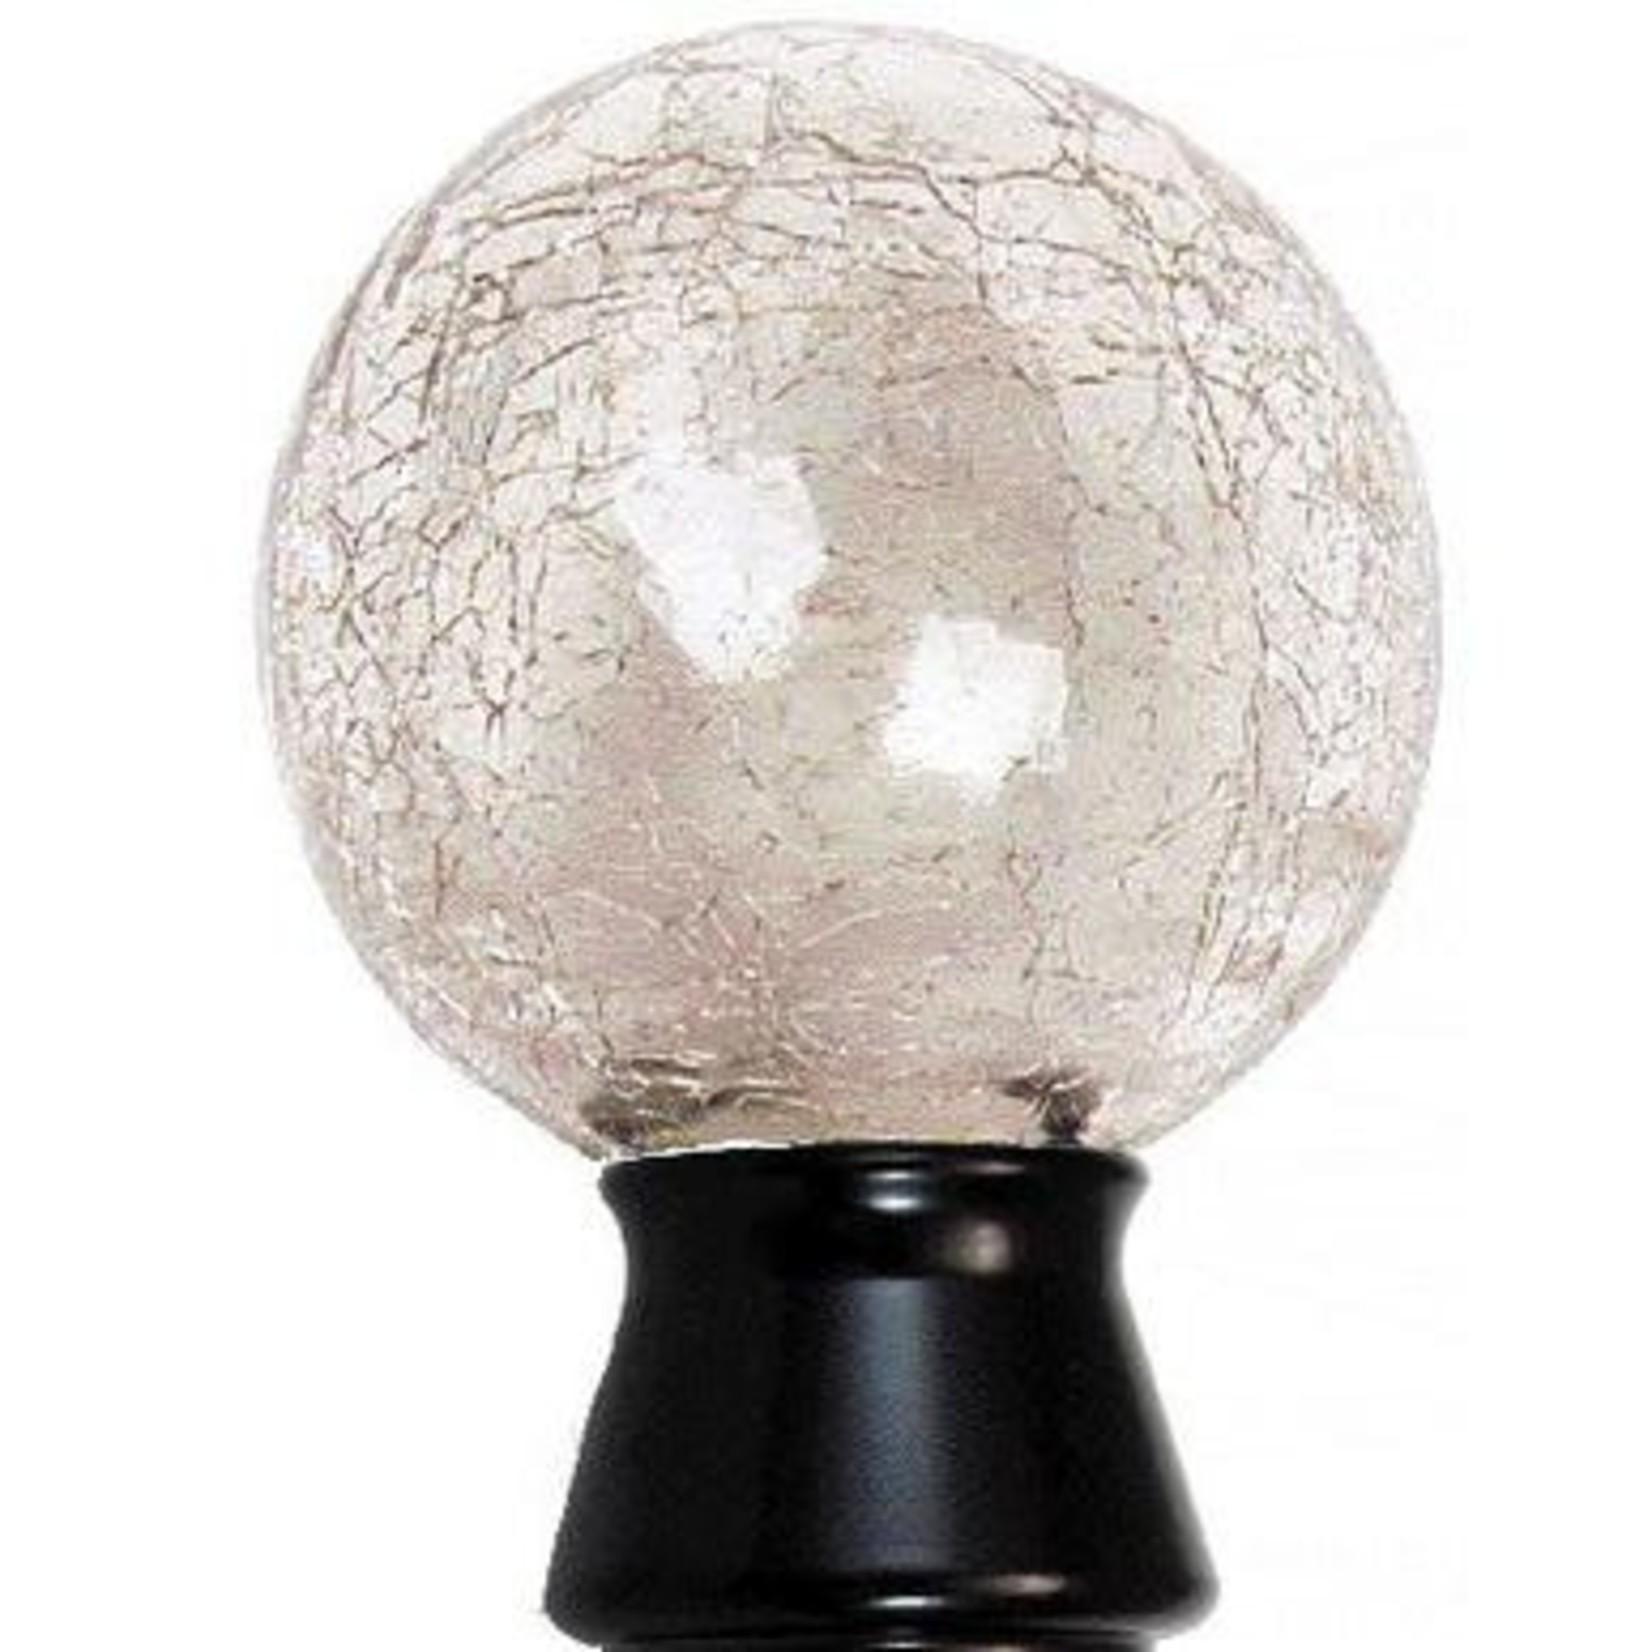 "Trendy Blinds Crackled Ball 1-1/8"" Ice Drapery Hardware Ensemble"